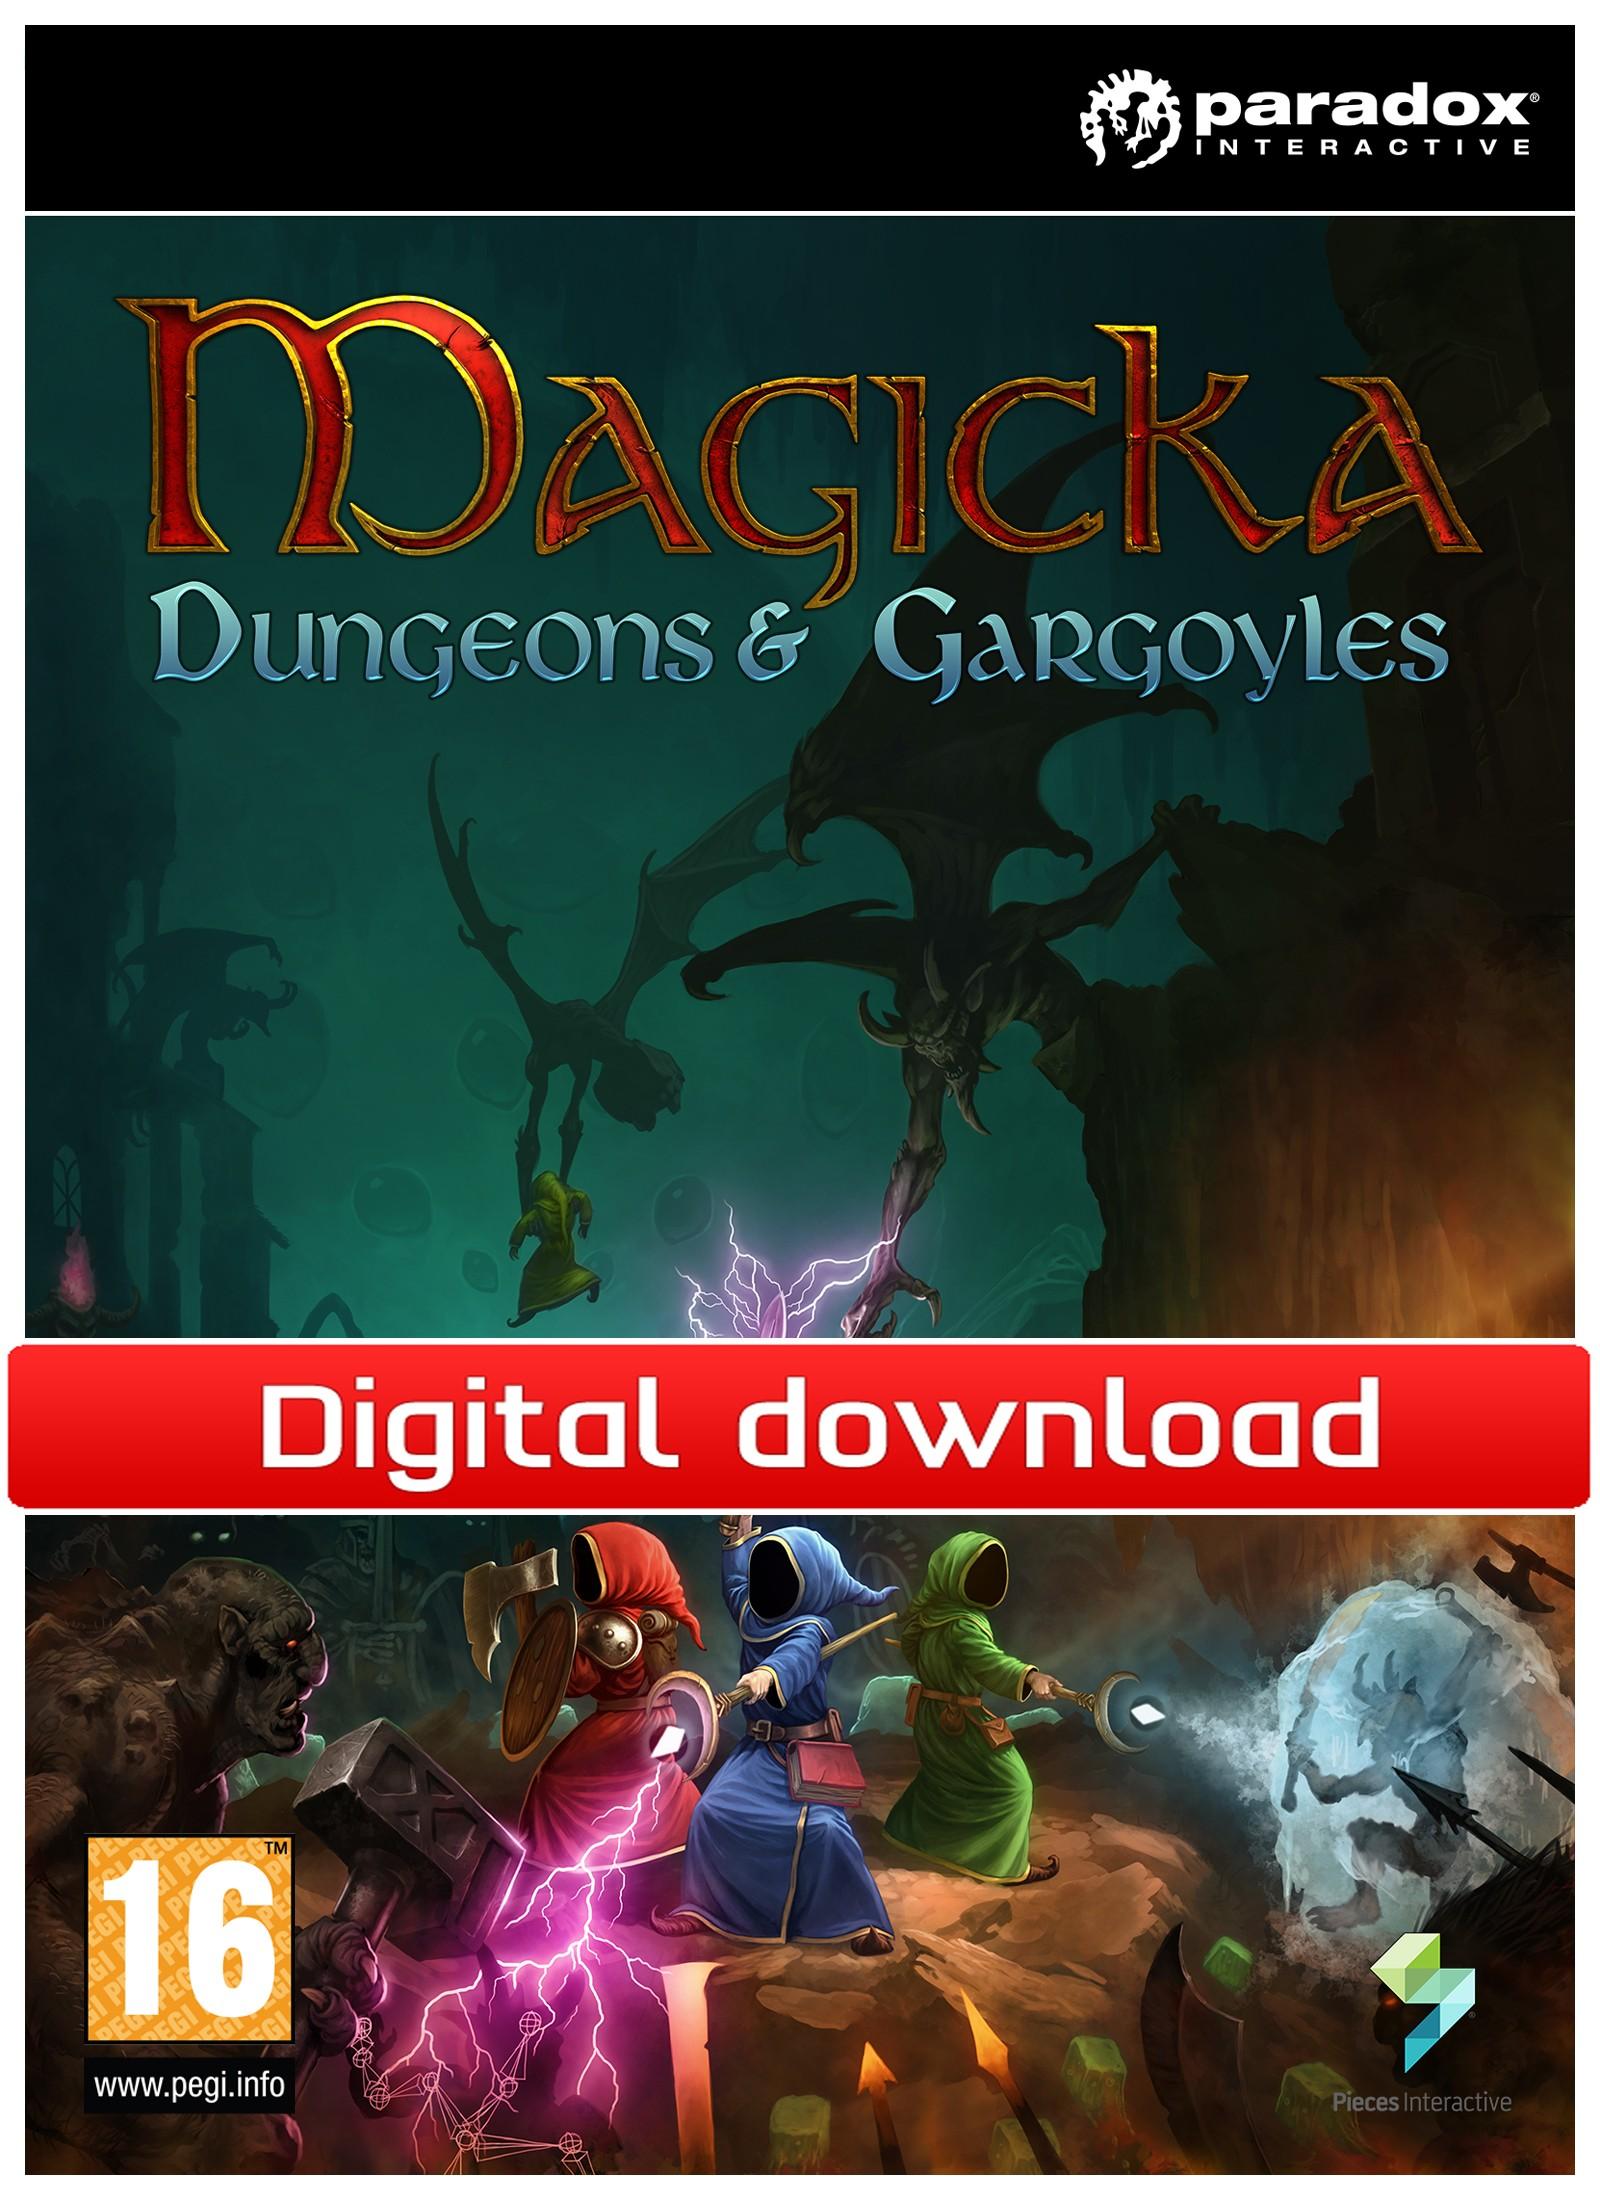 Magicka DLC: Dungeons & Gargoyles (PC nedlastning) PCDD34077